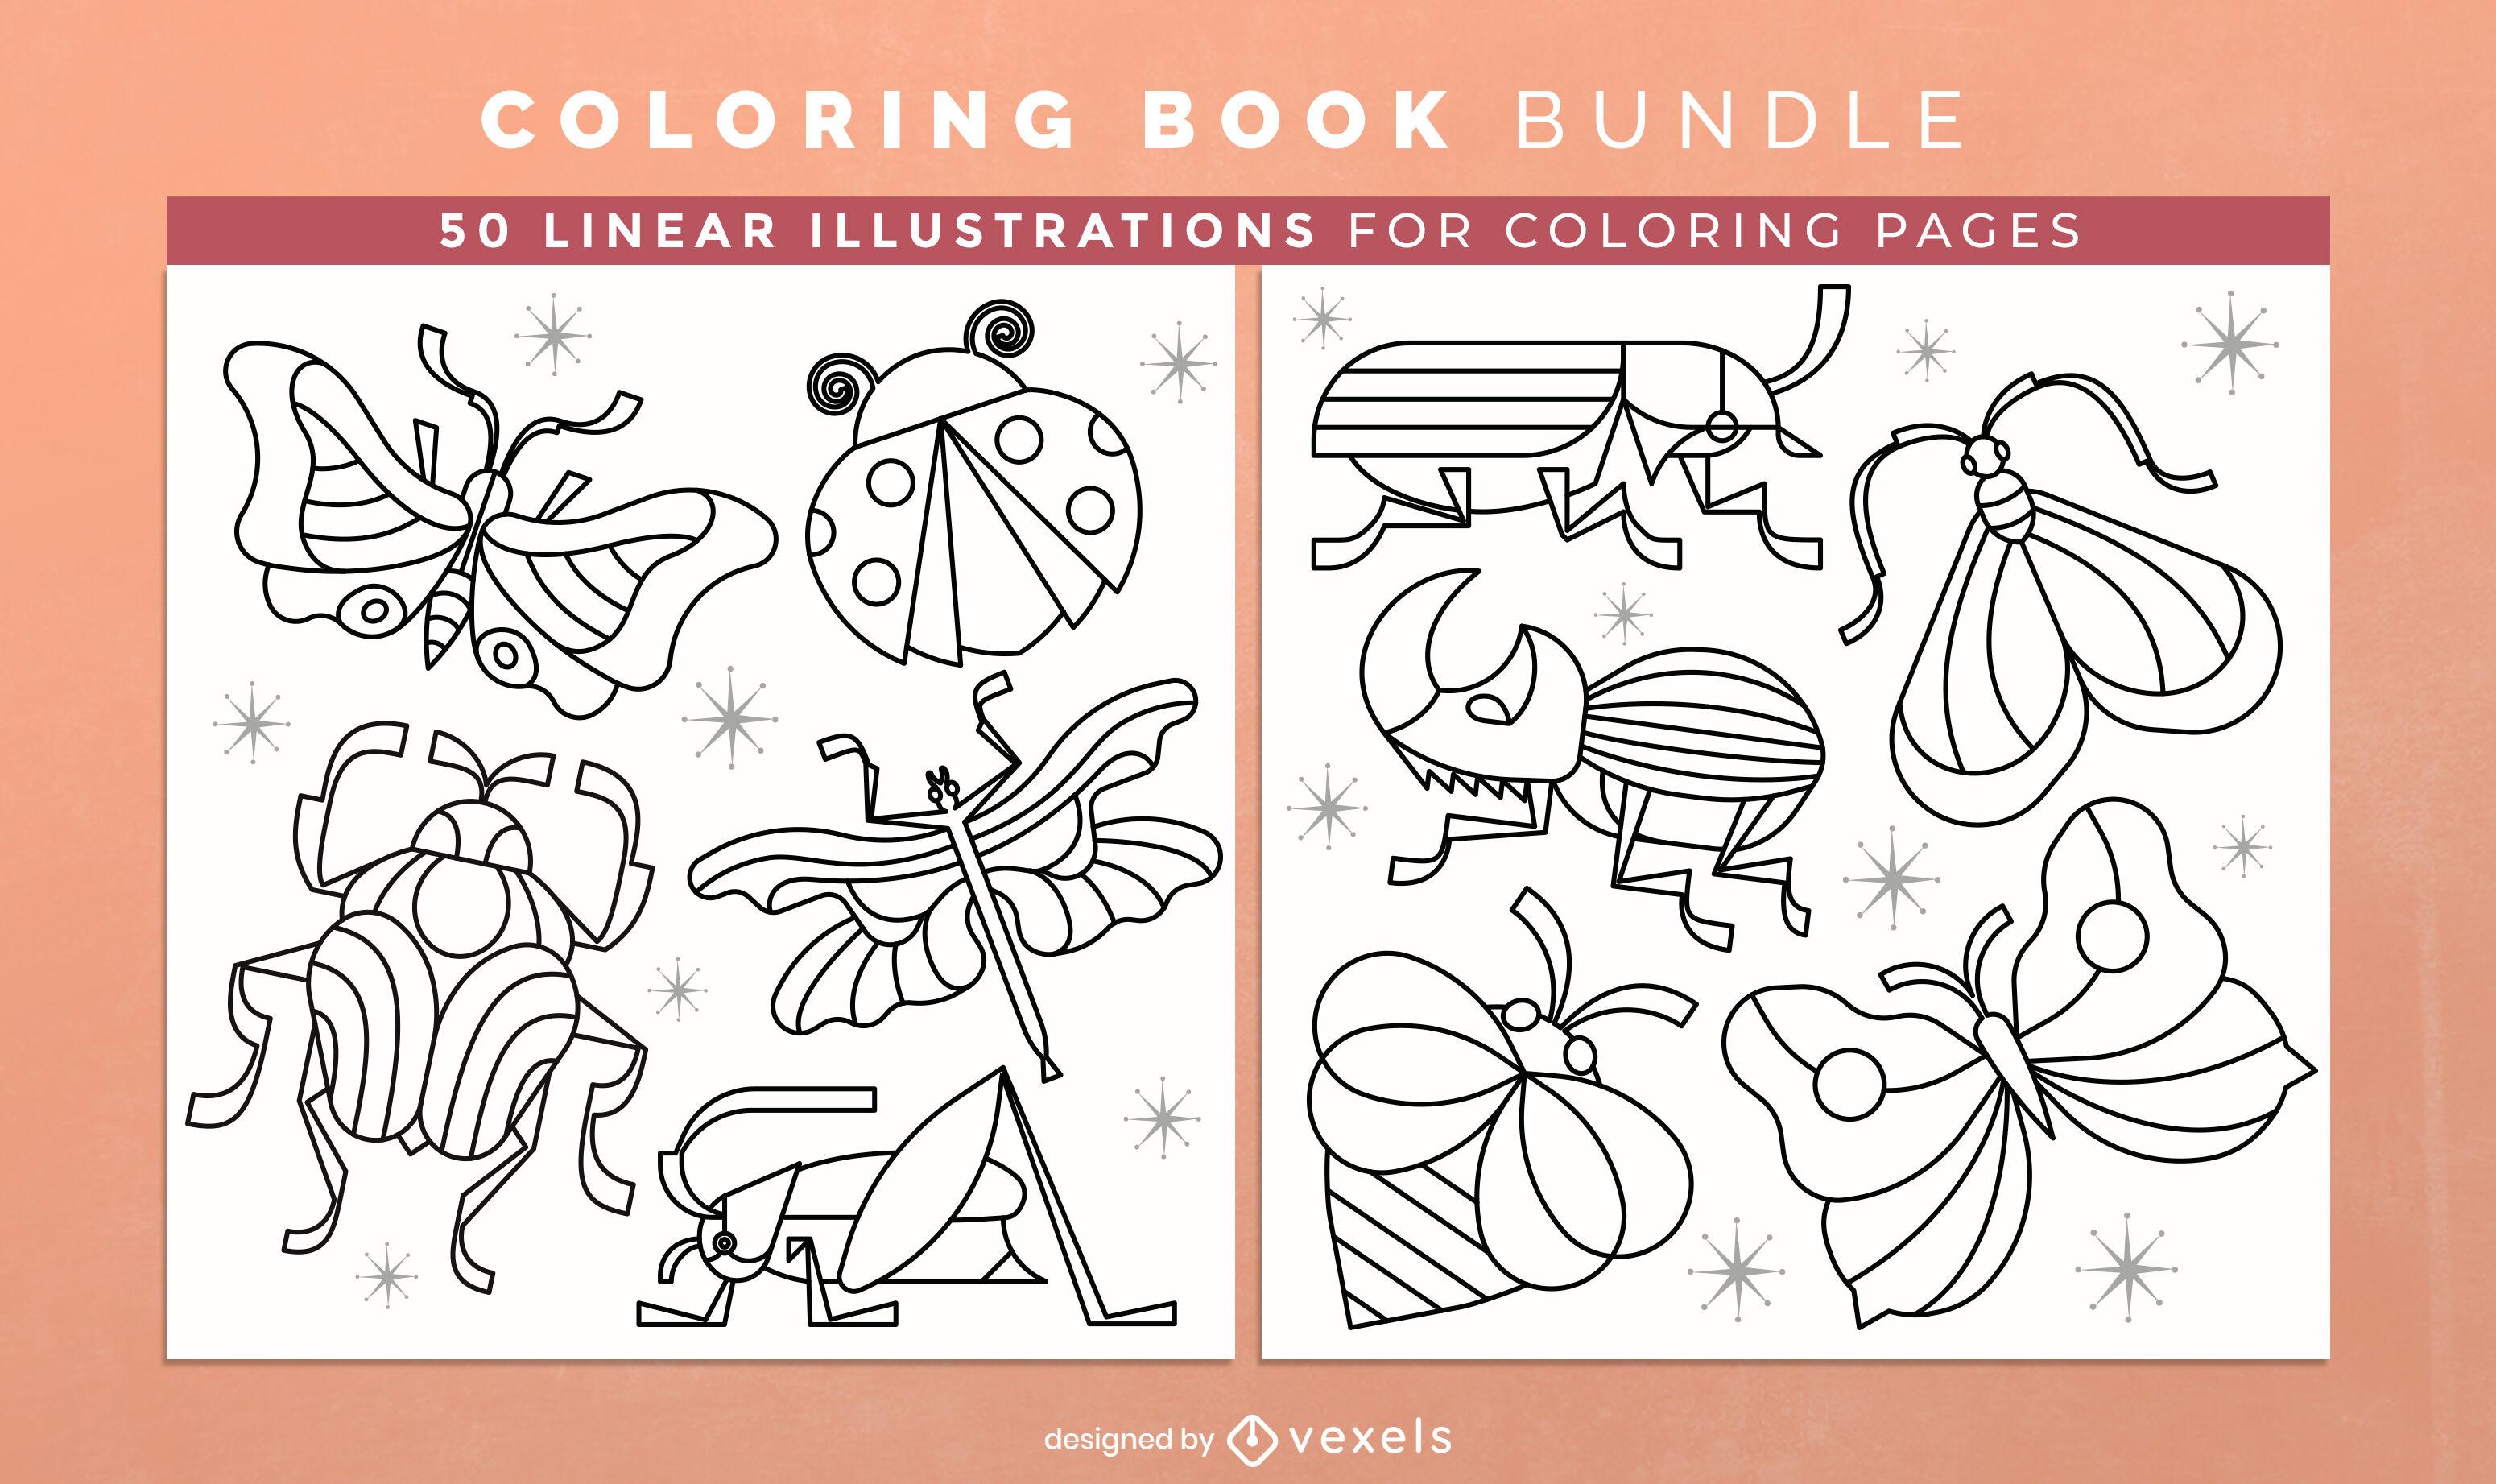 Livro para colorir de insetos KDP design de interiores